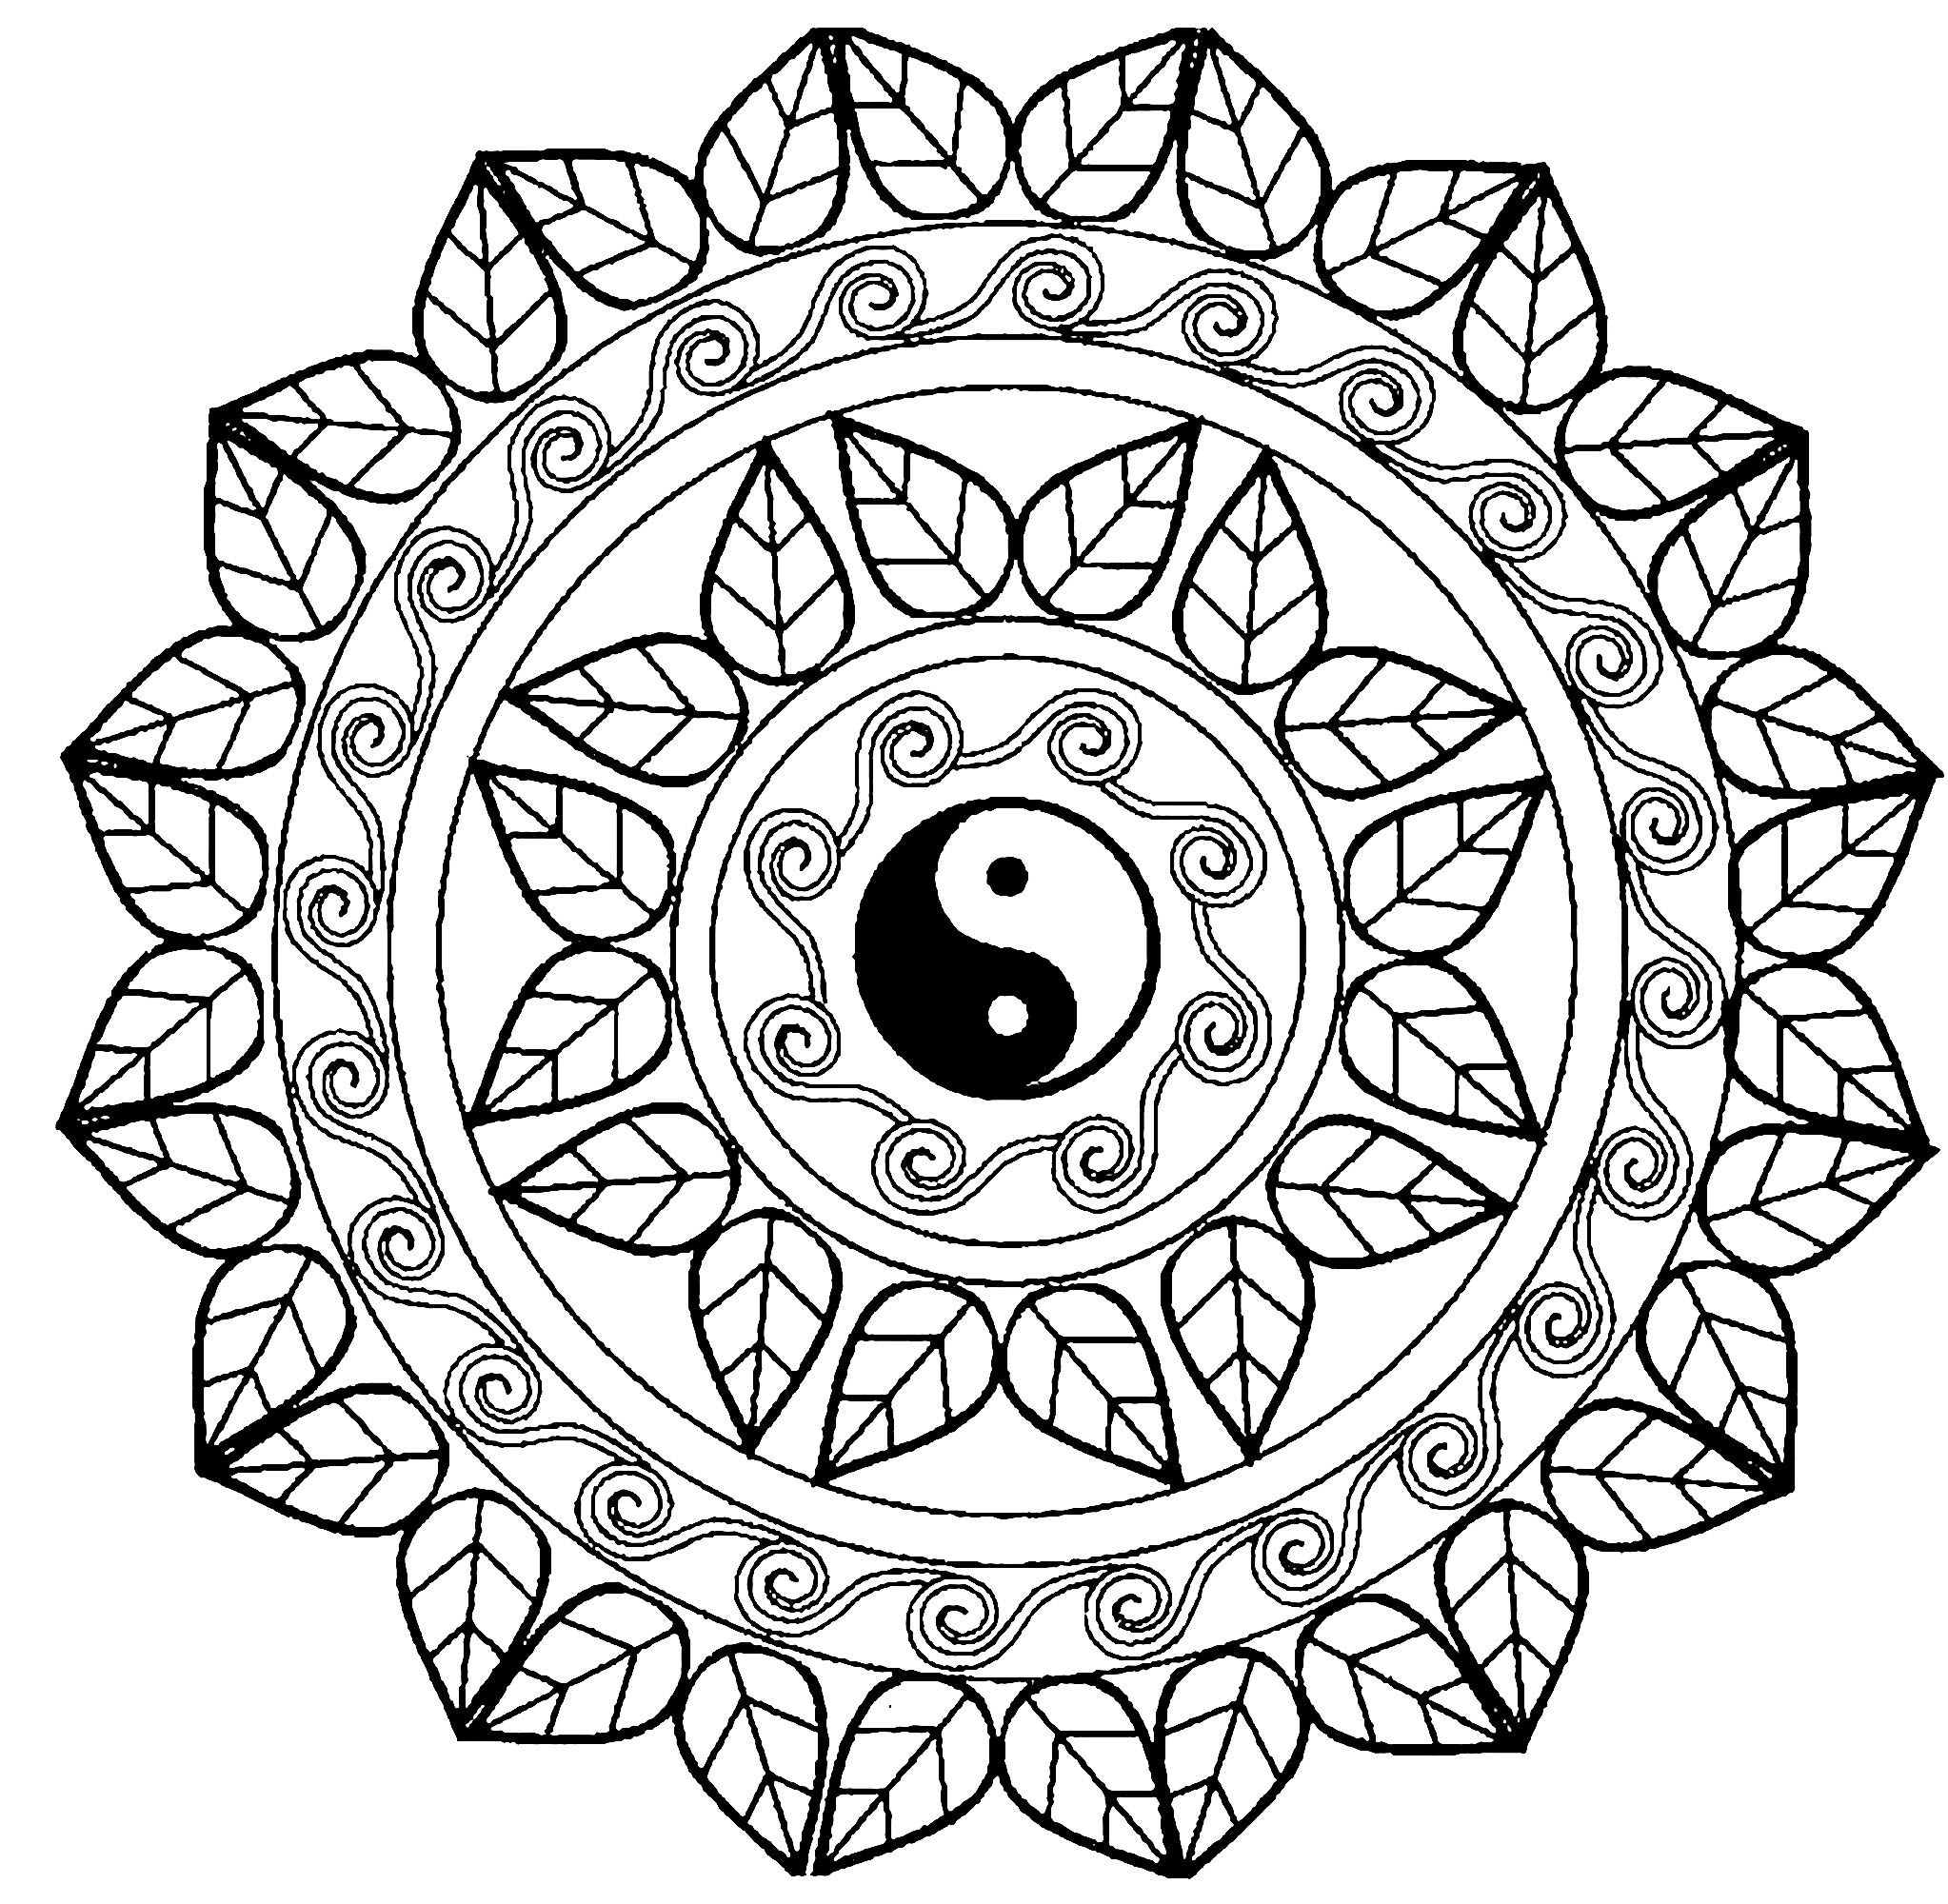 Mandala Para Dibujar. Free Printable Coloring Pages For Adults ...